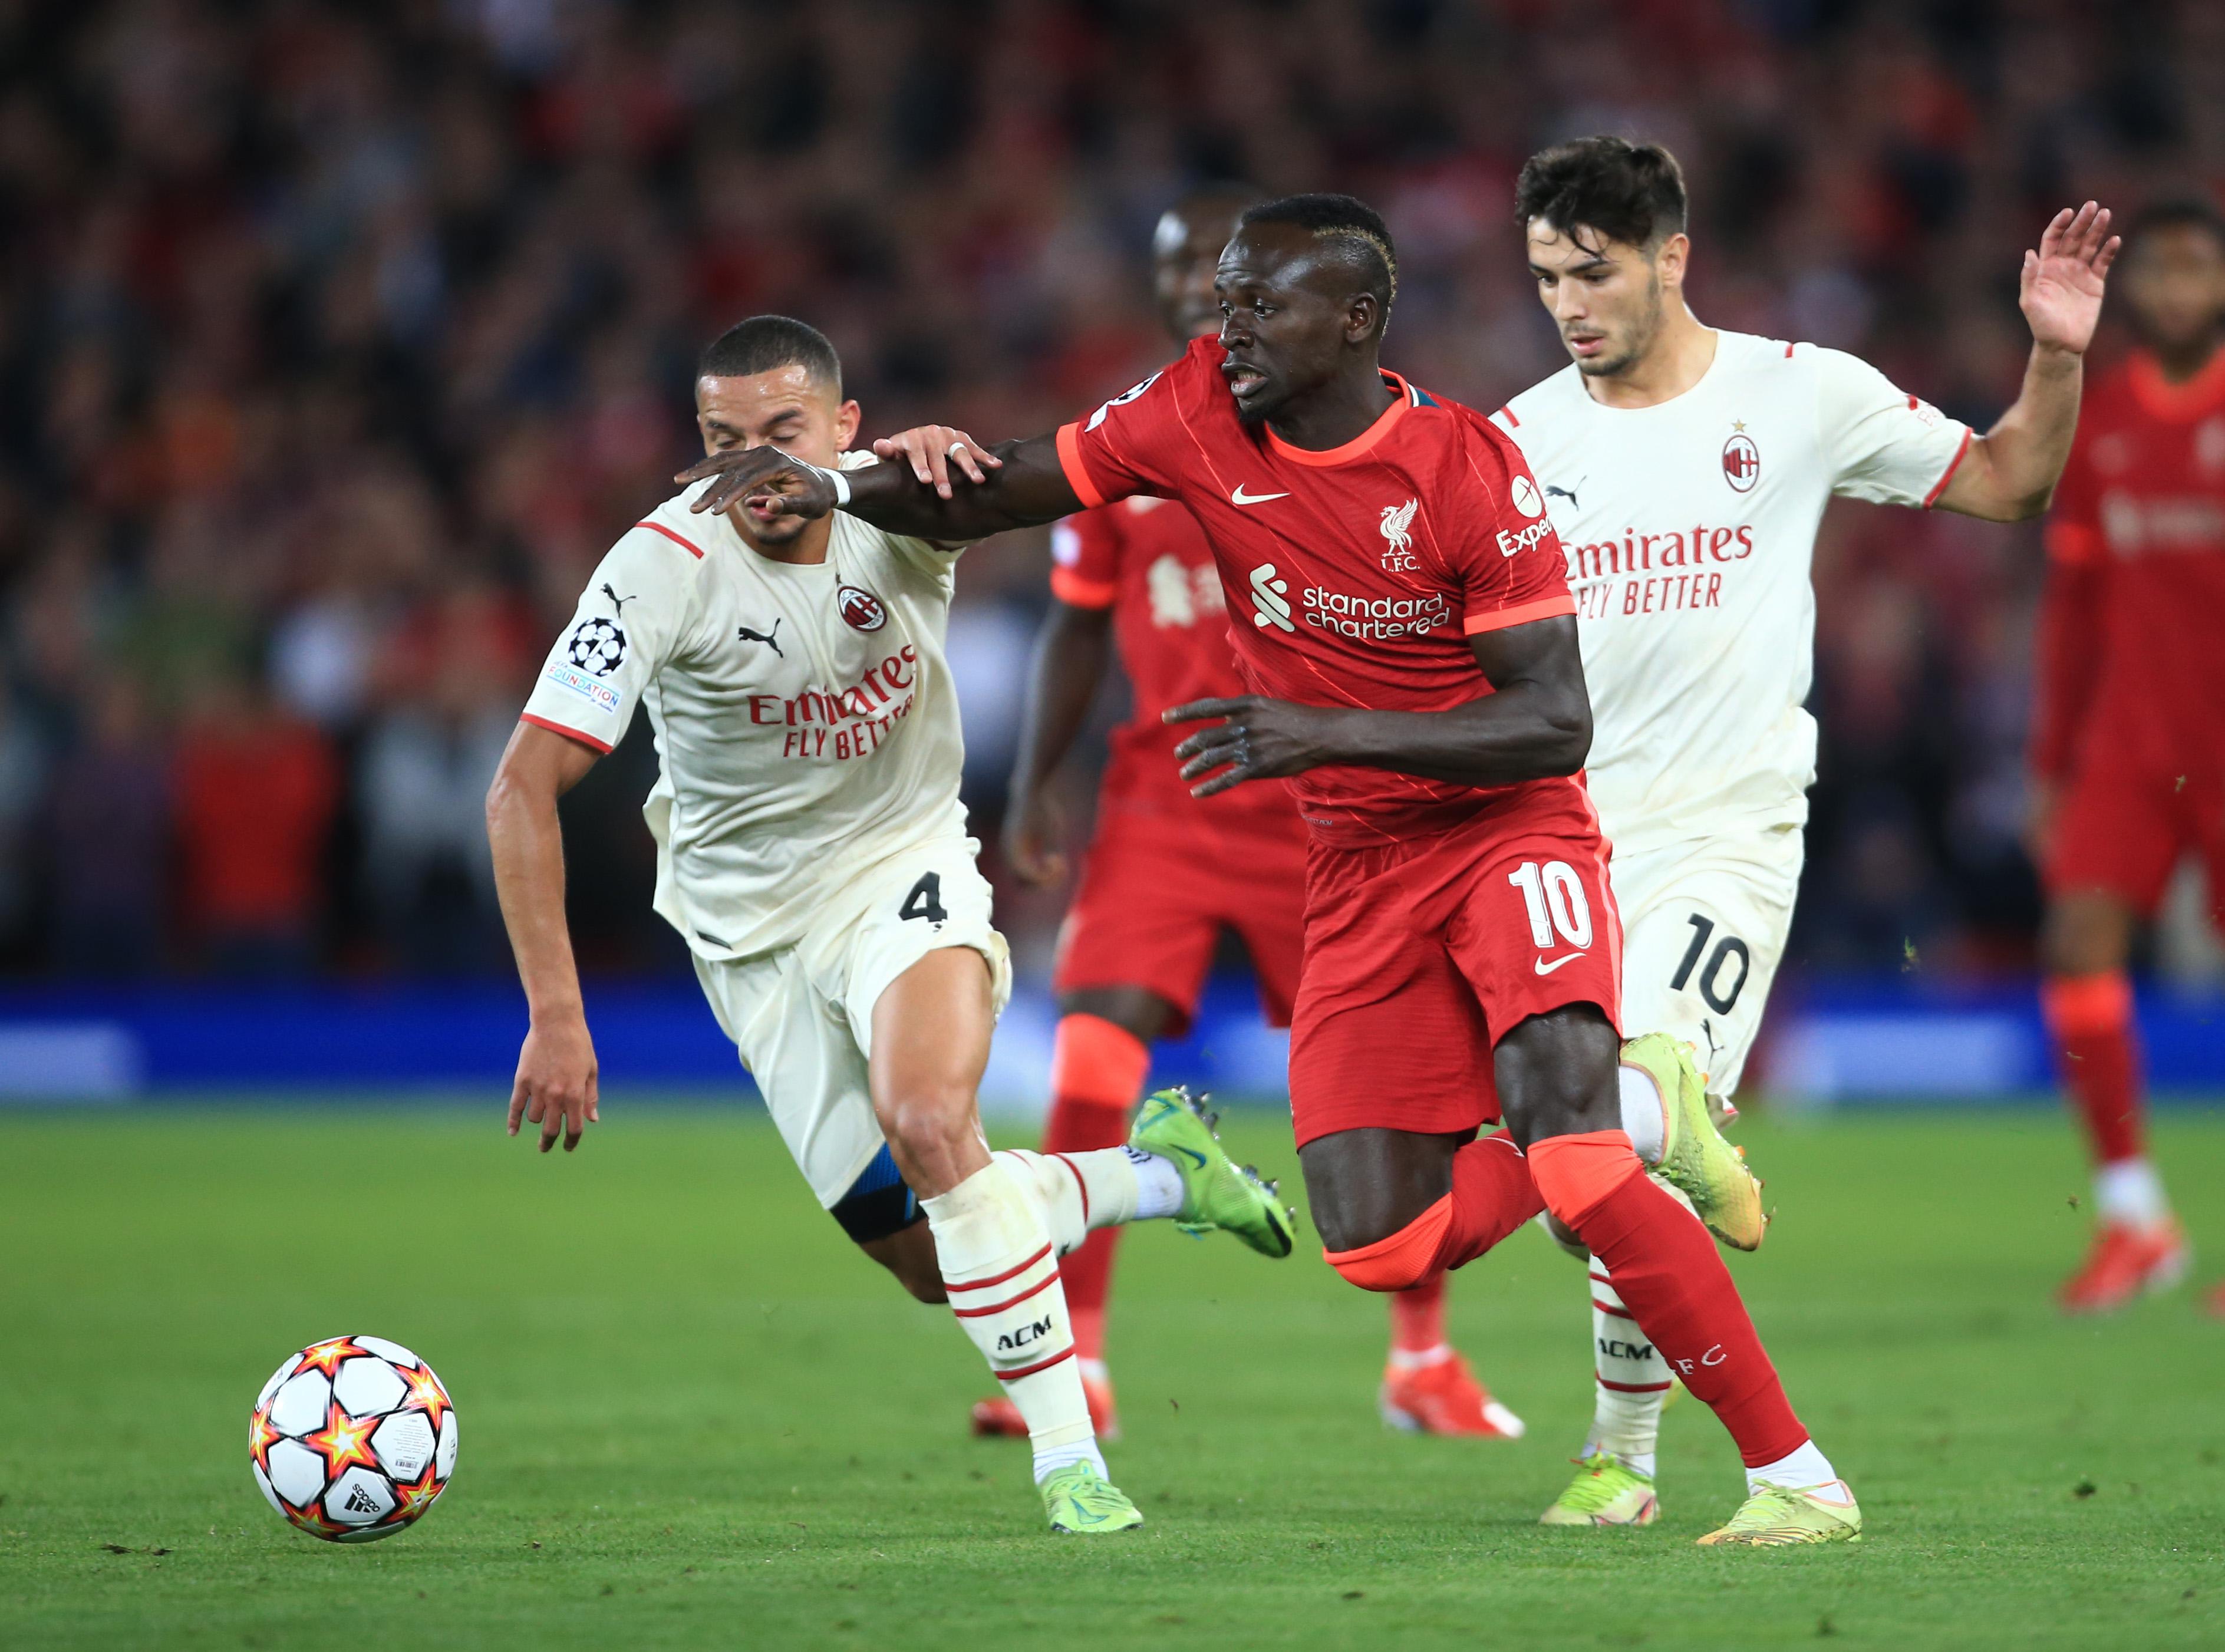 Liverpool FC v AC Milan: Group B - UEFA Champions League